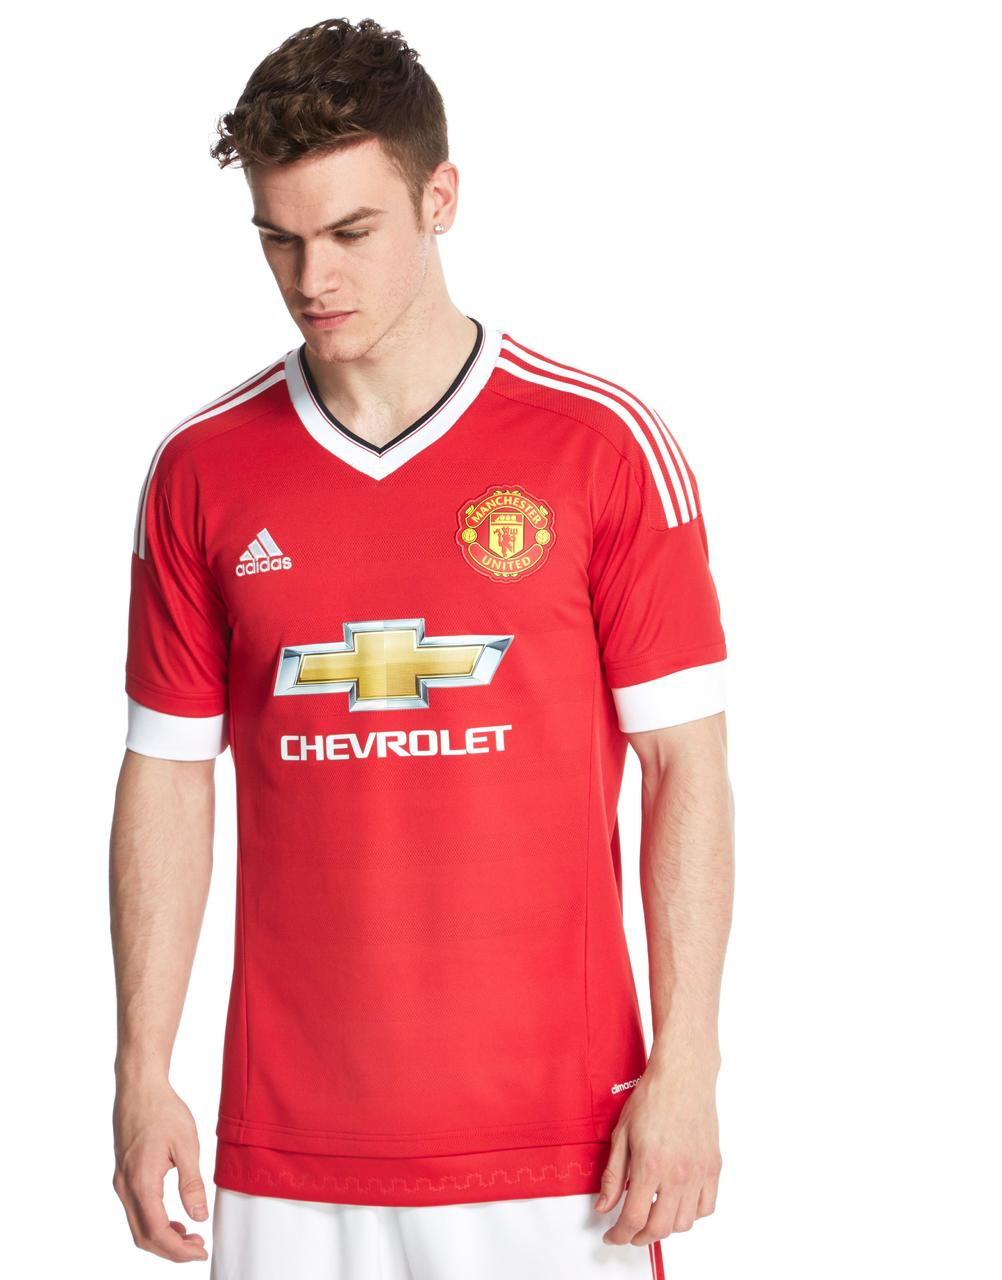 bb427eaae Football Shirt Culture Manchester United 15 16 – EDGE Engineering ...